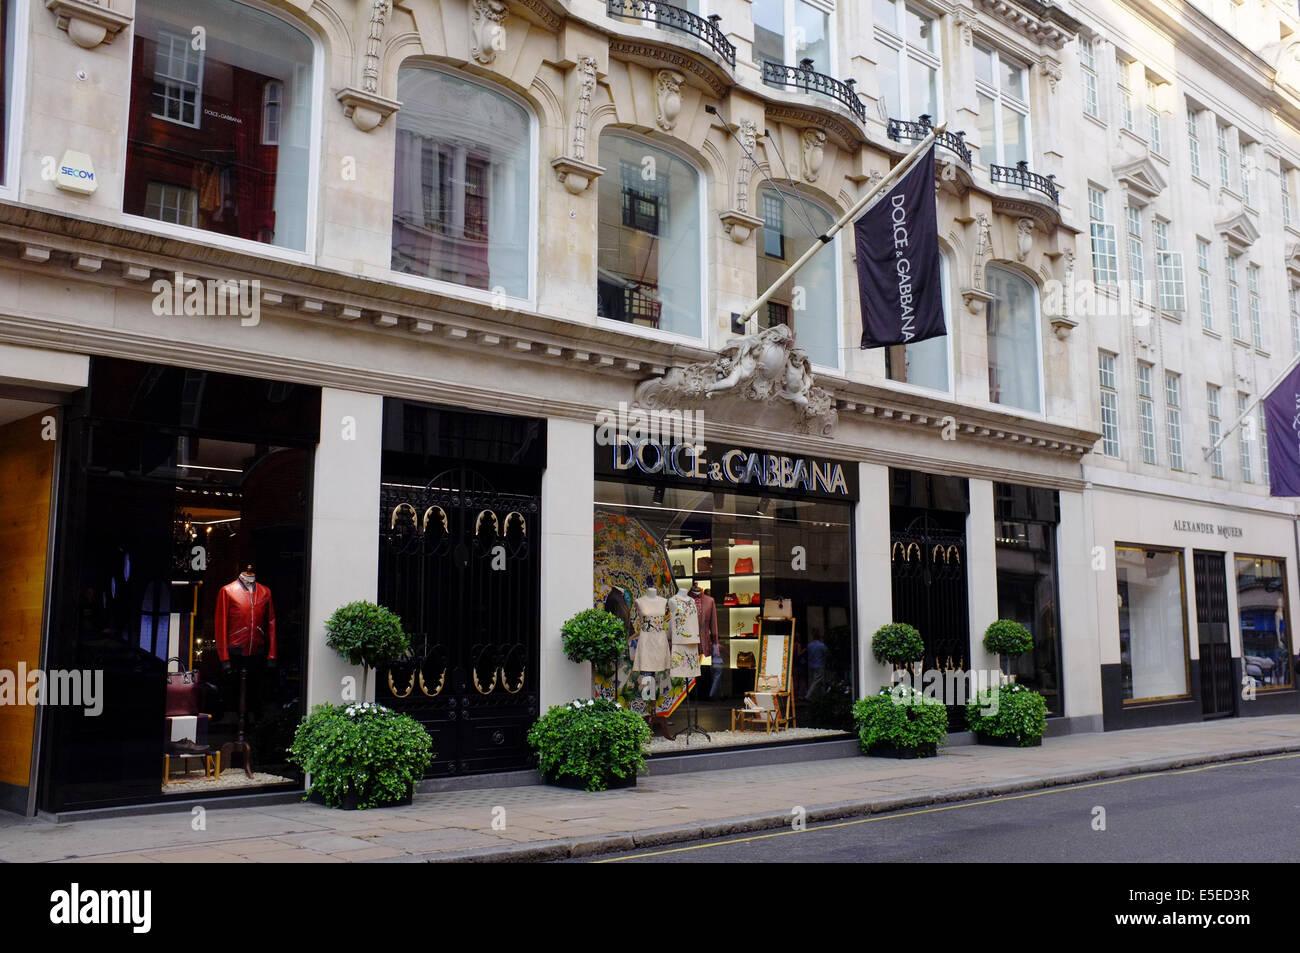 DOLCE & GABBANA designer fashion boutique on Bond Street, London - Stock Image